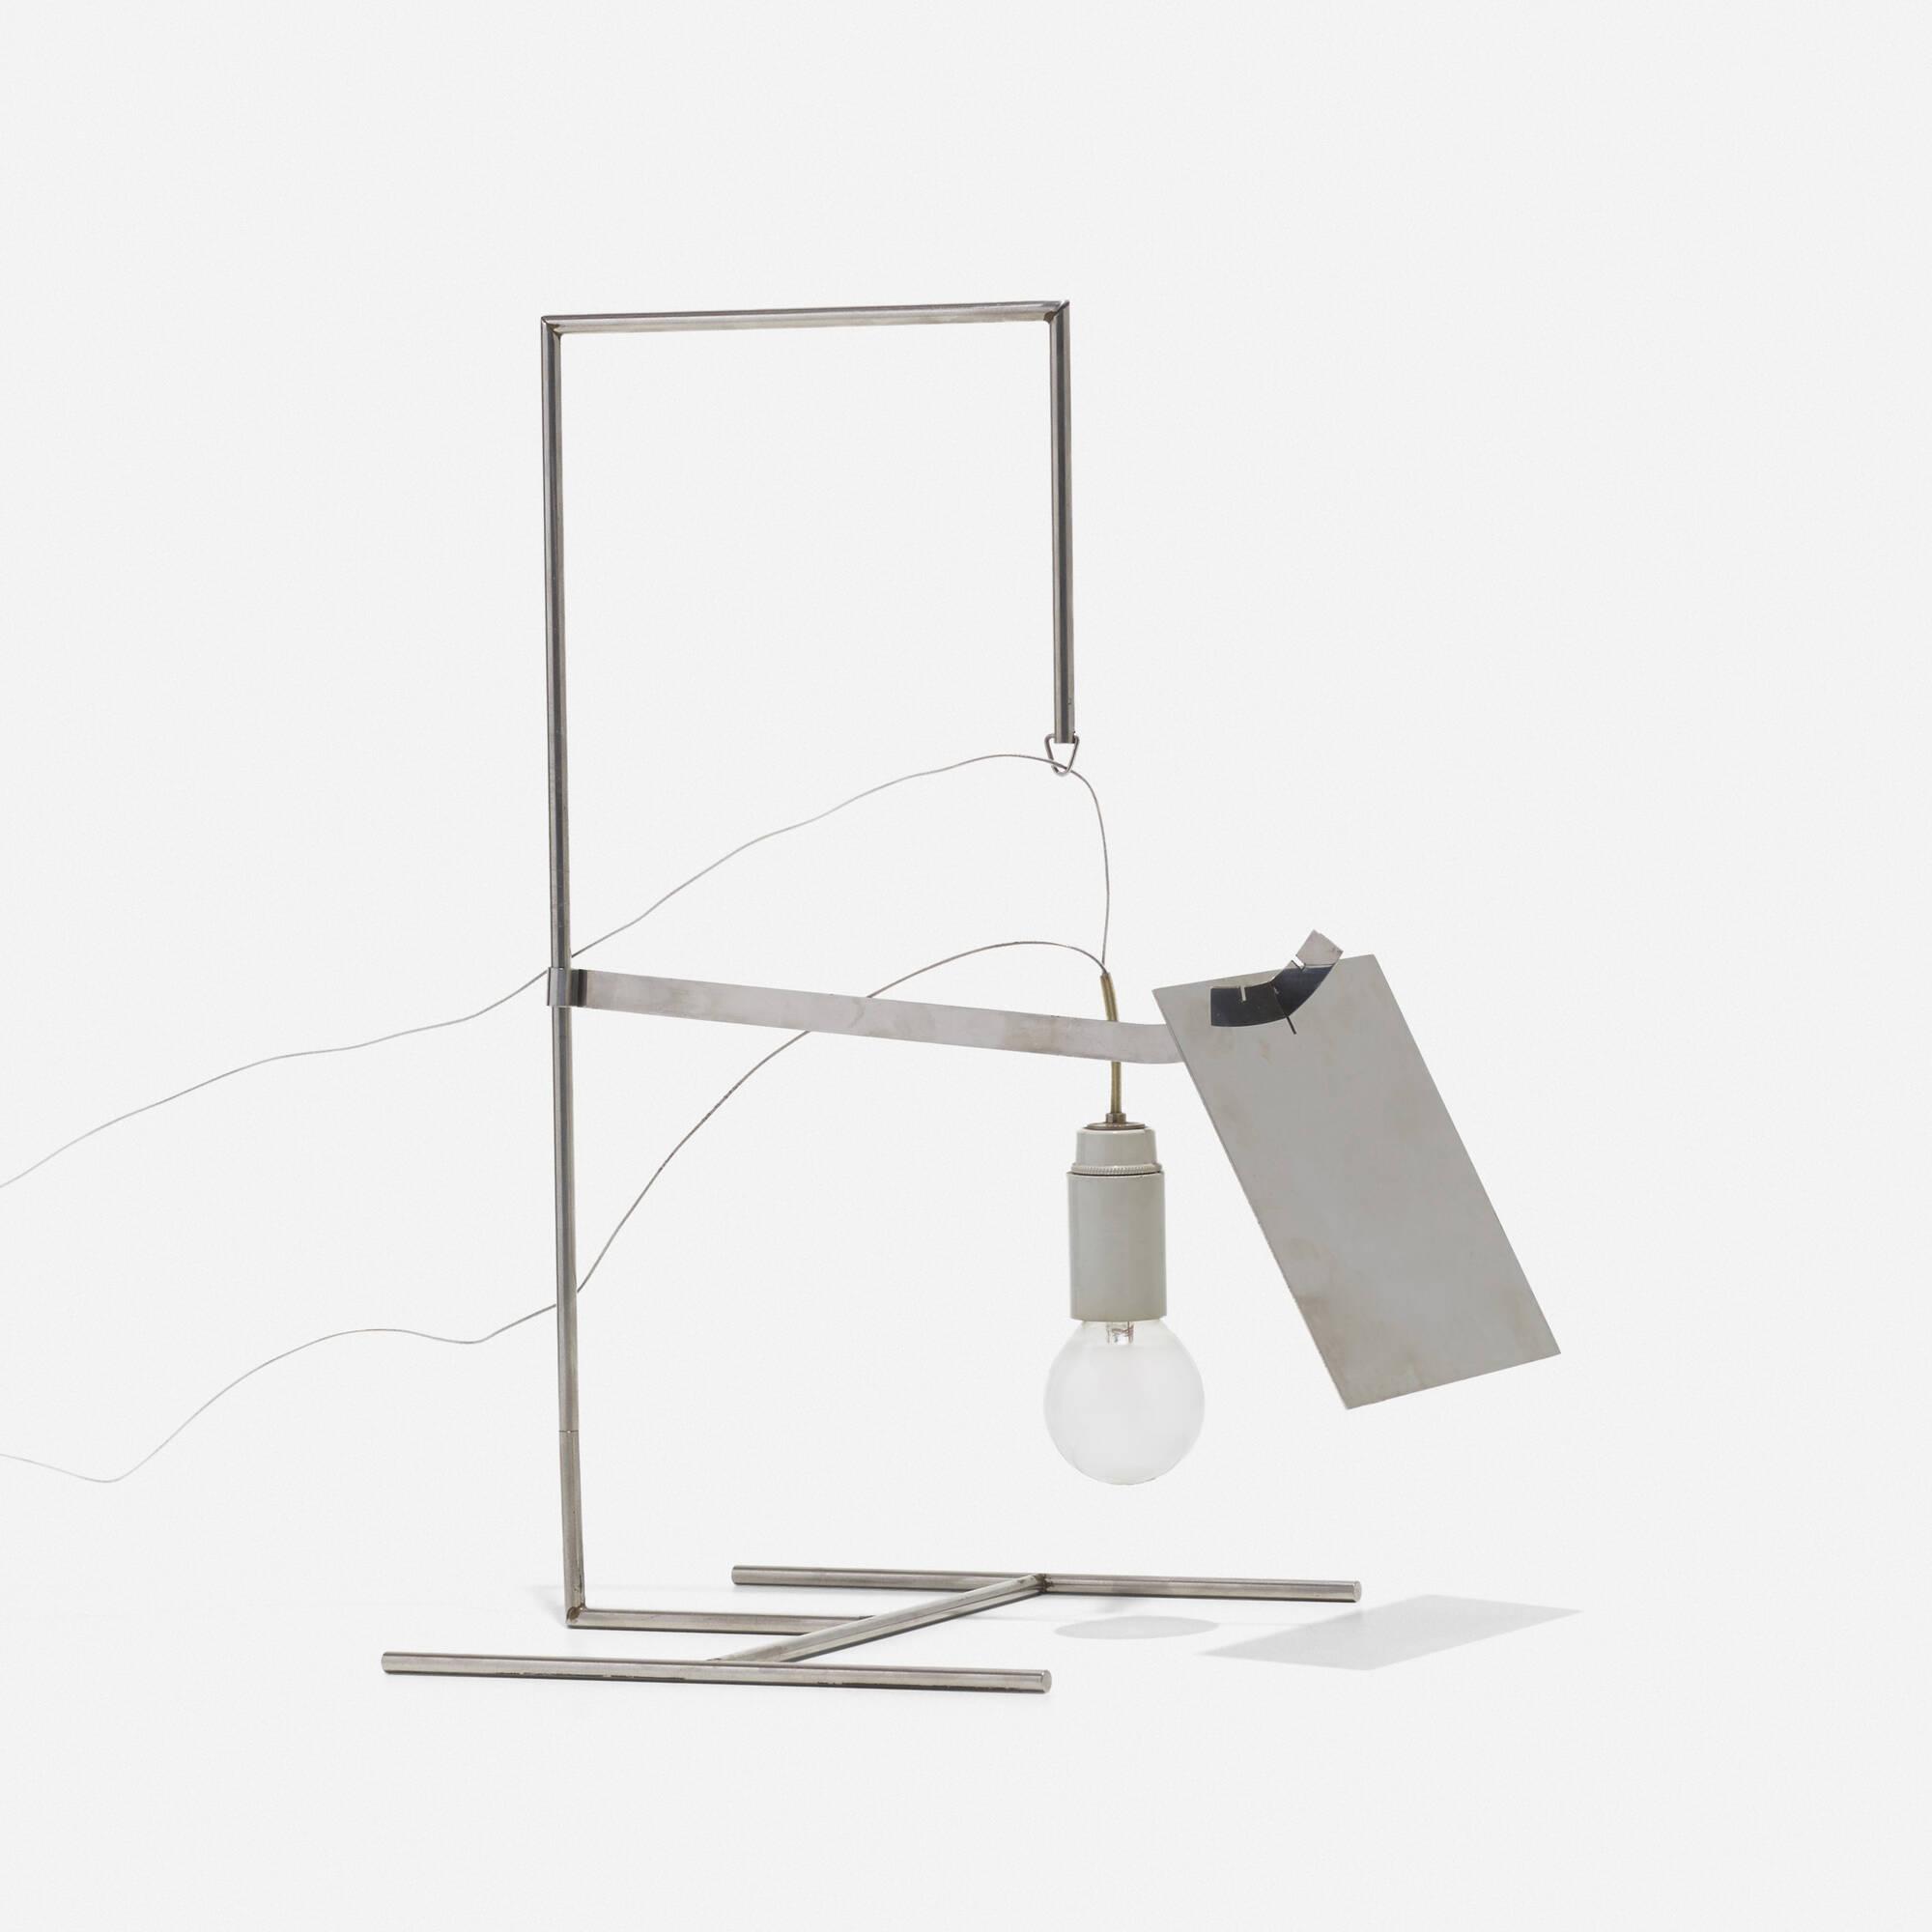 445: Alvaro Siza / Fil table lamp (1 of 1)